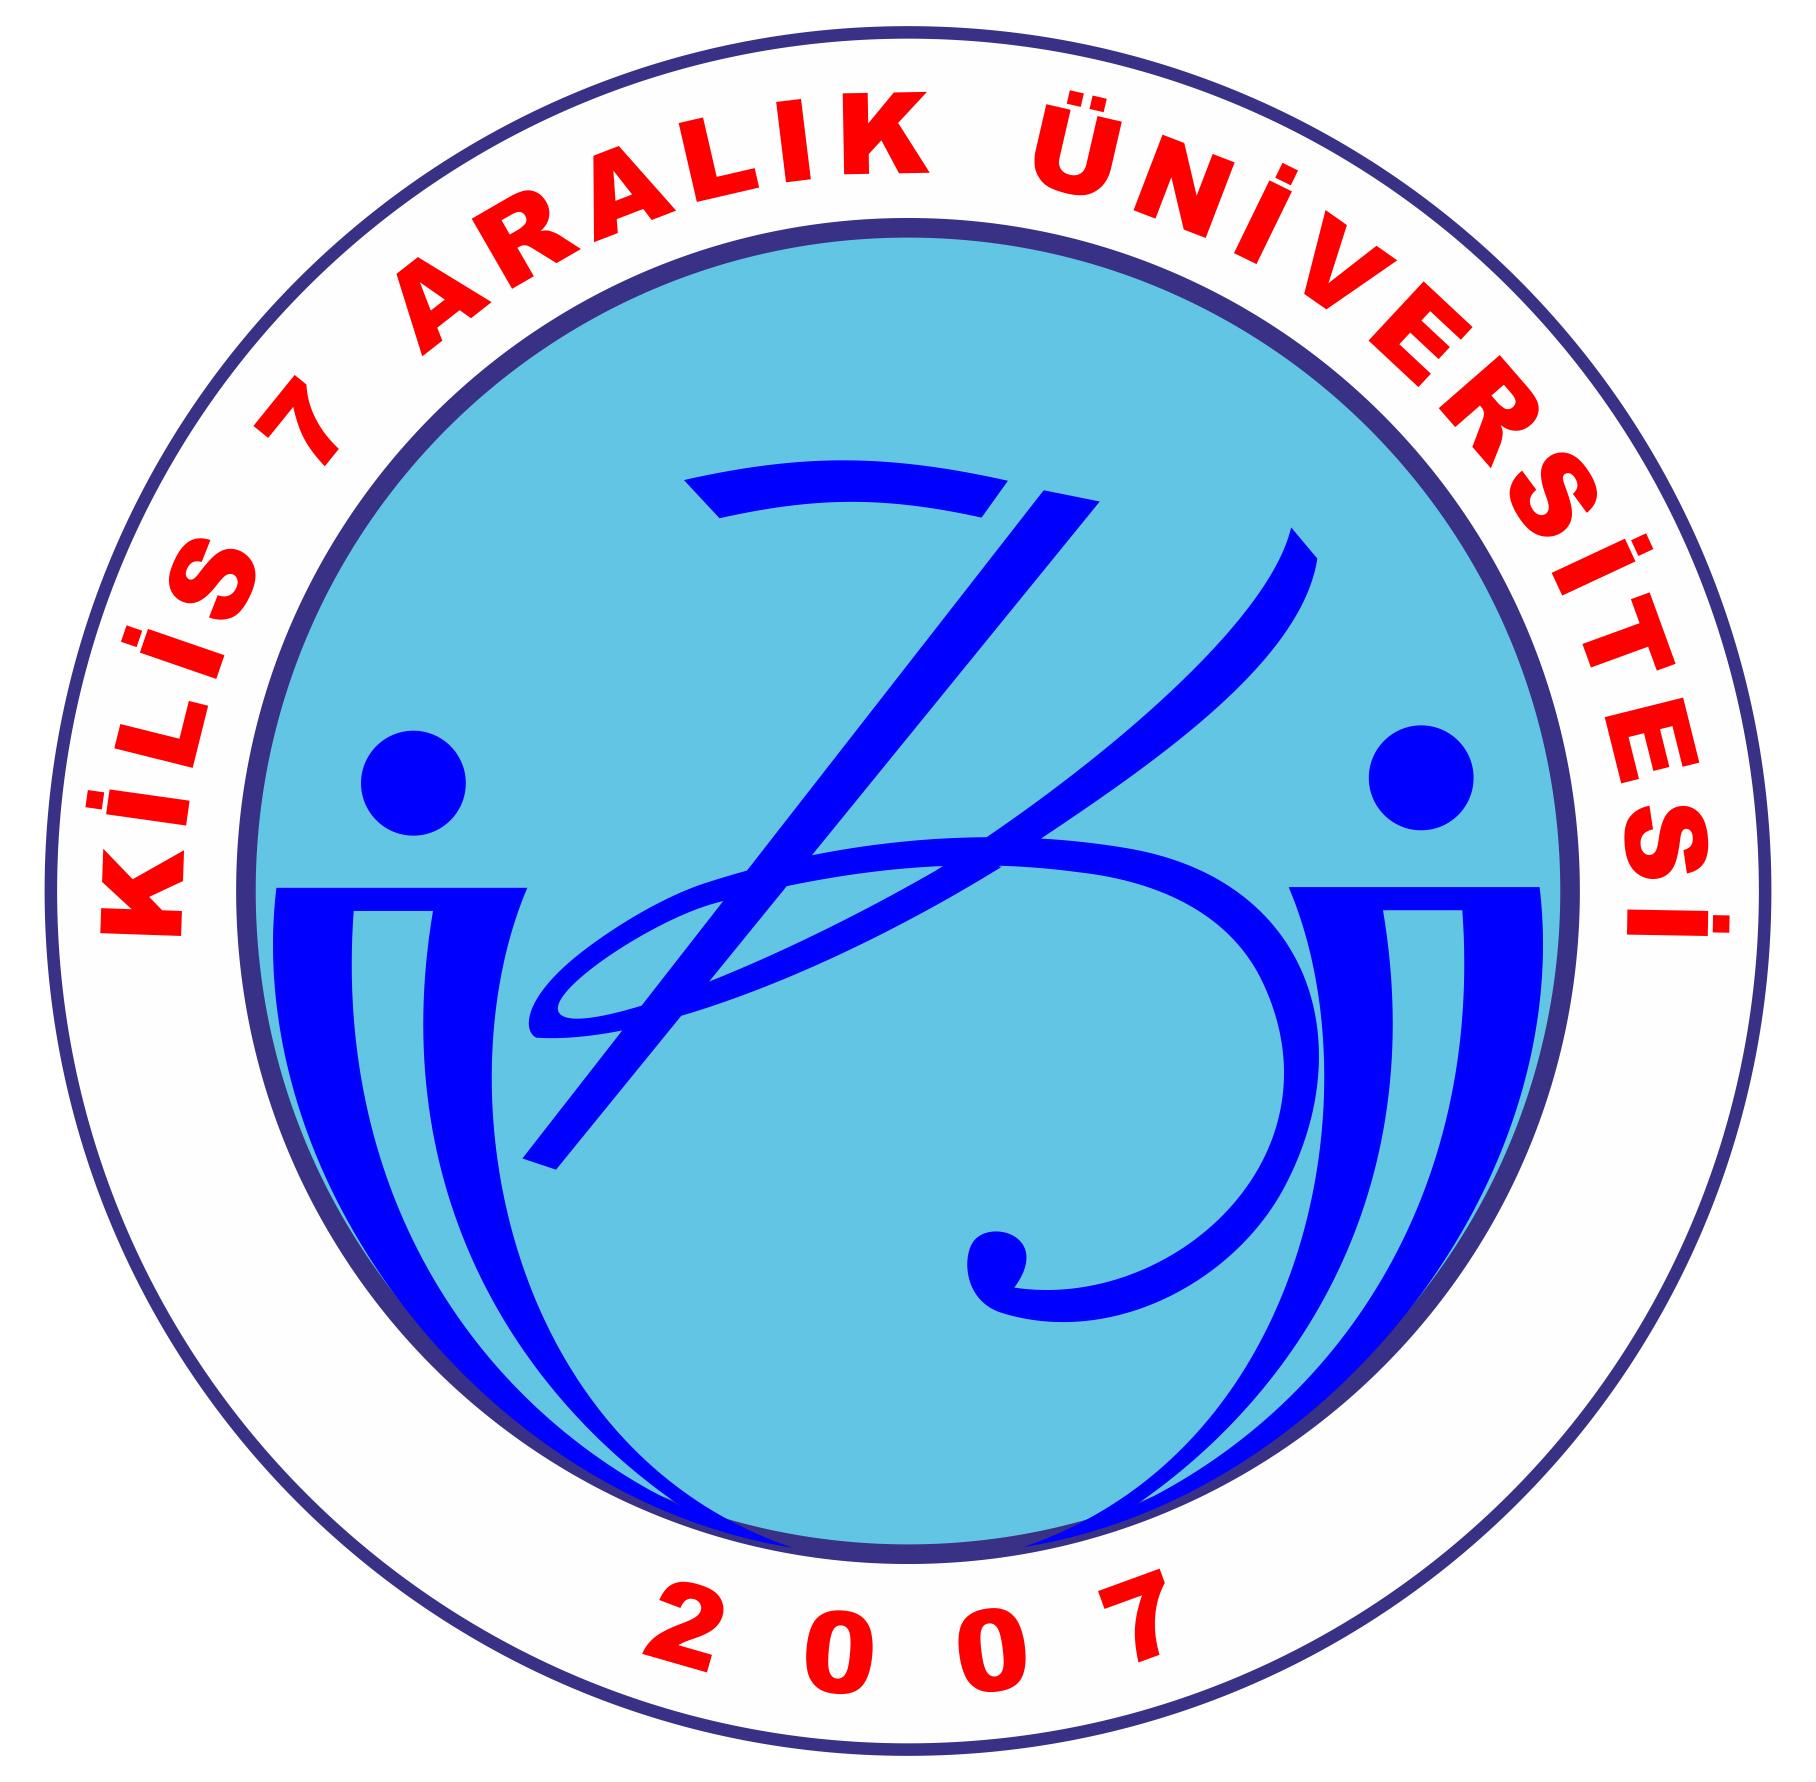 TUAS | KILIS 7 ARALIK UNIVERSITY